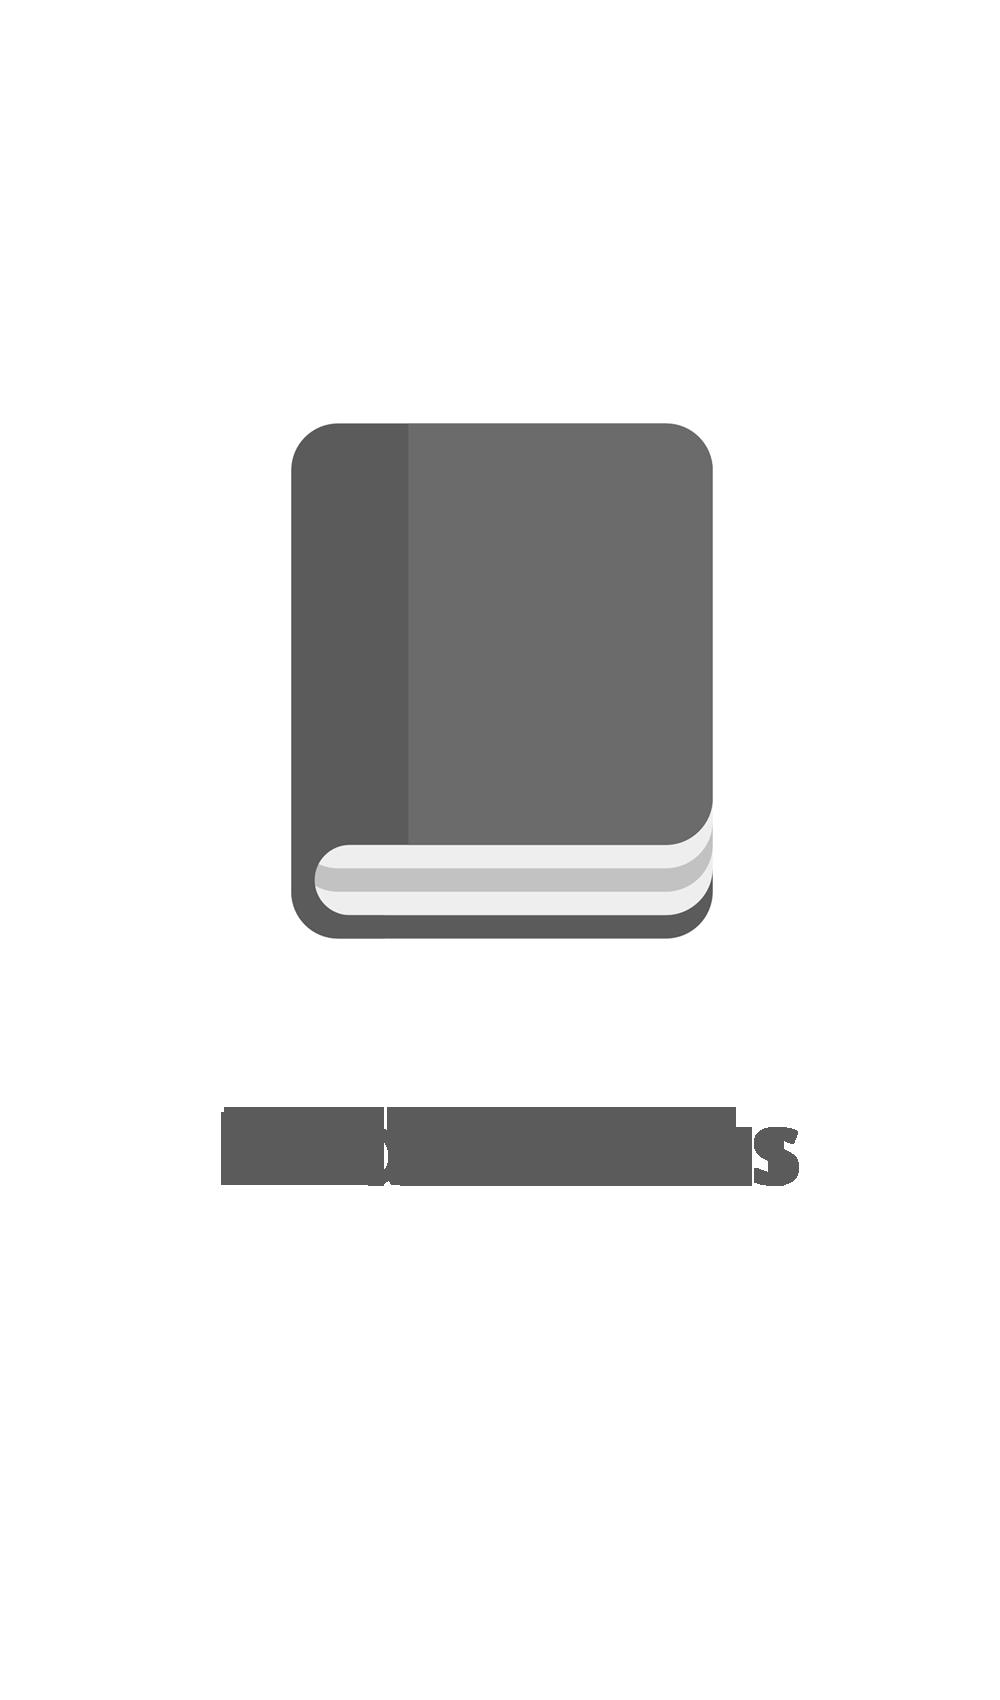 Springboard 2 Elevfacit